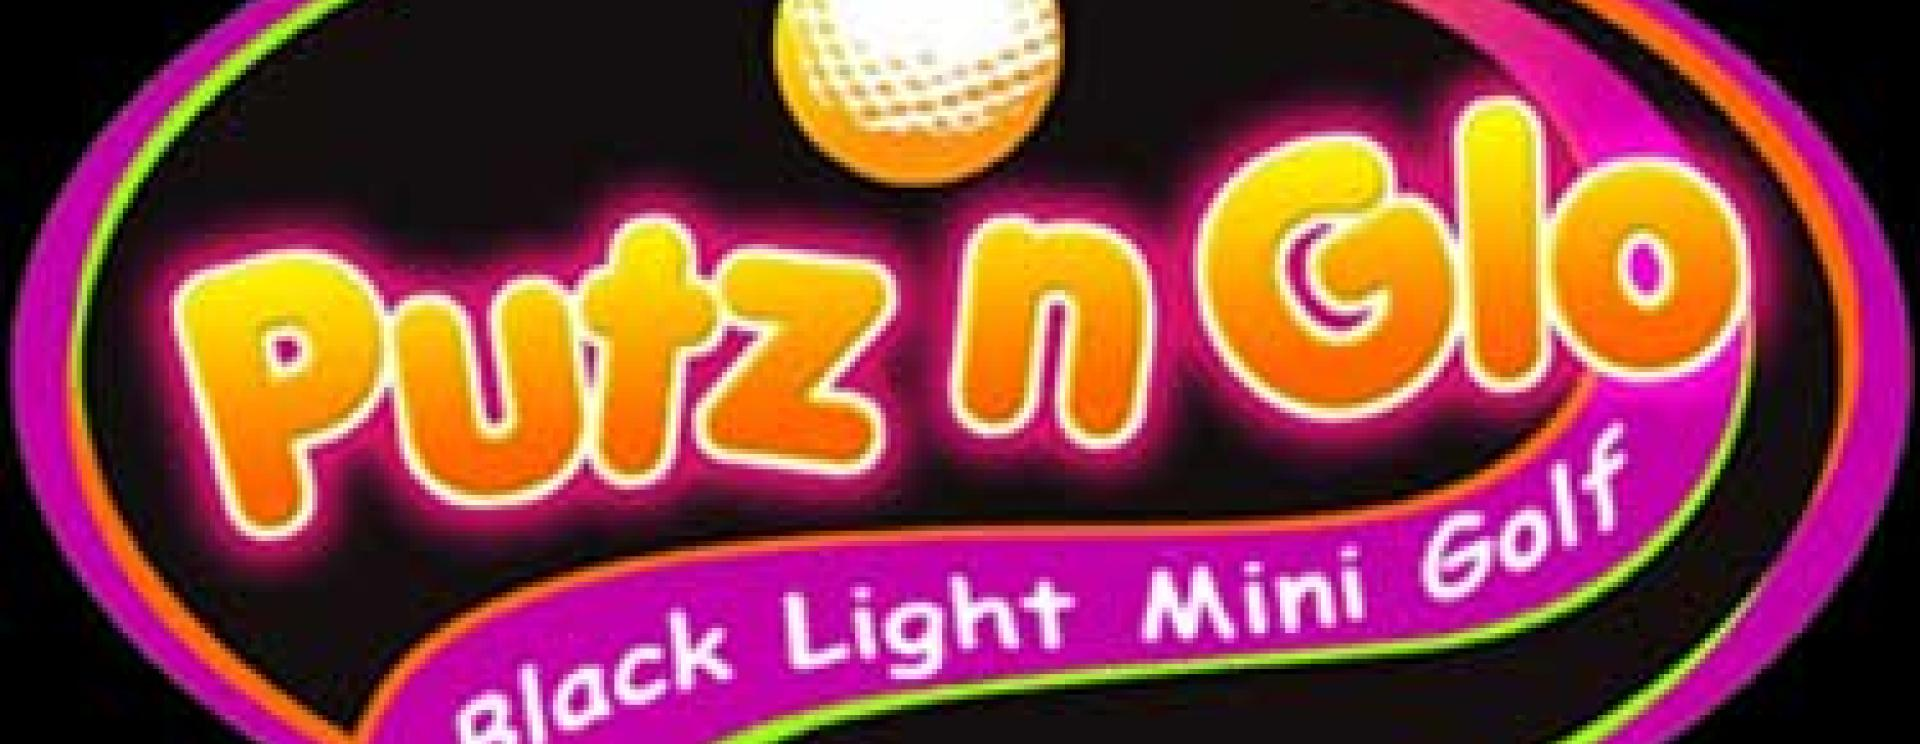 Putz n Glo Black Light Miniature Golf